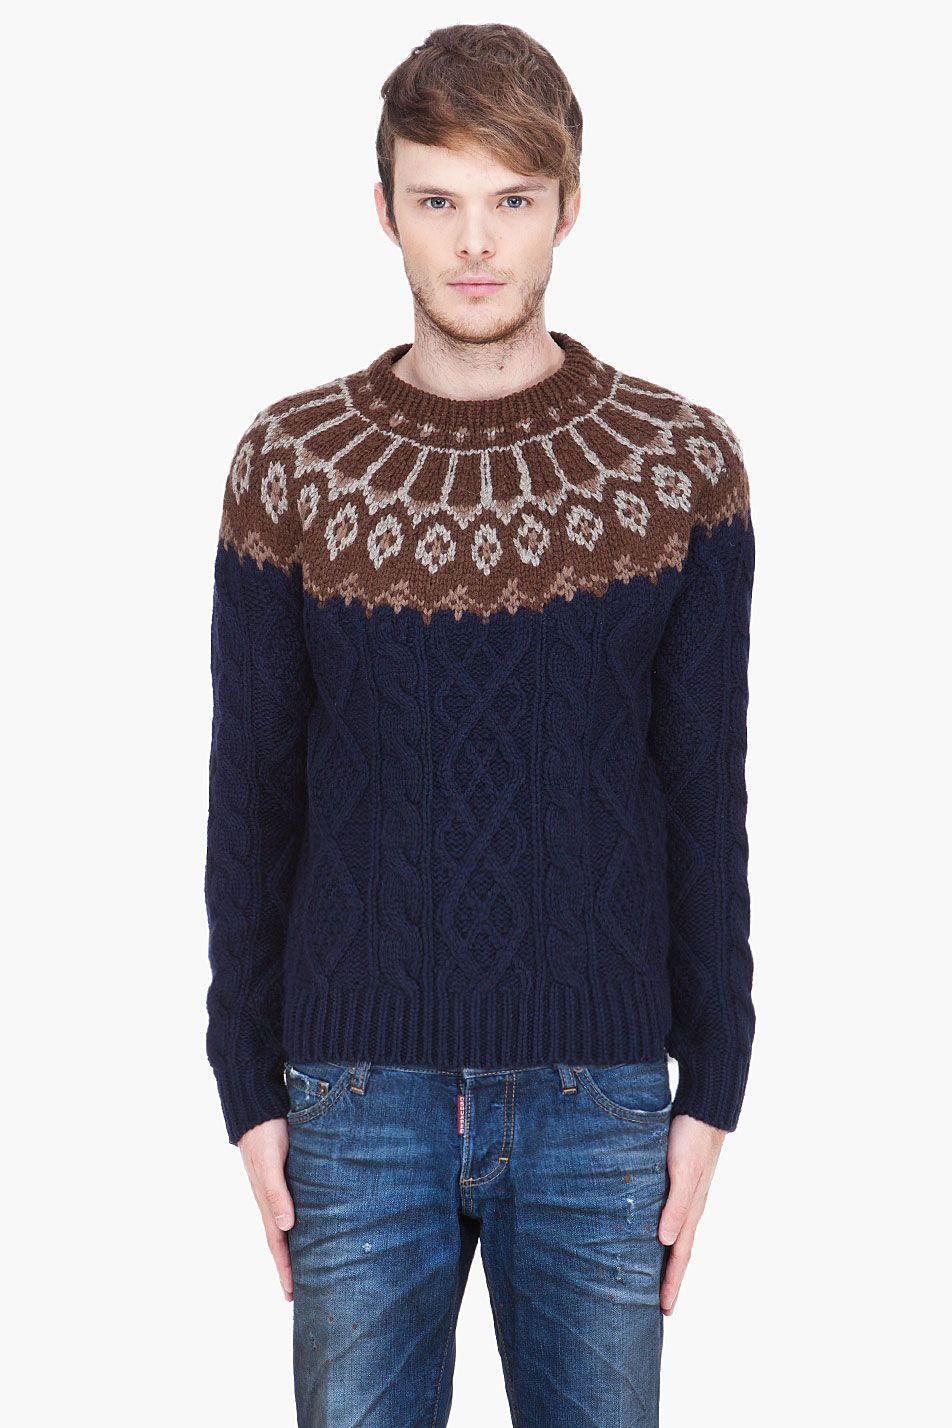 Knitting inspiration: Faire Isle and Fisherman's rib combination sweater by SASQUATCHFABRIX